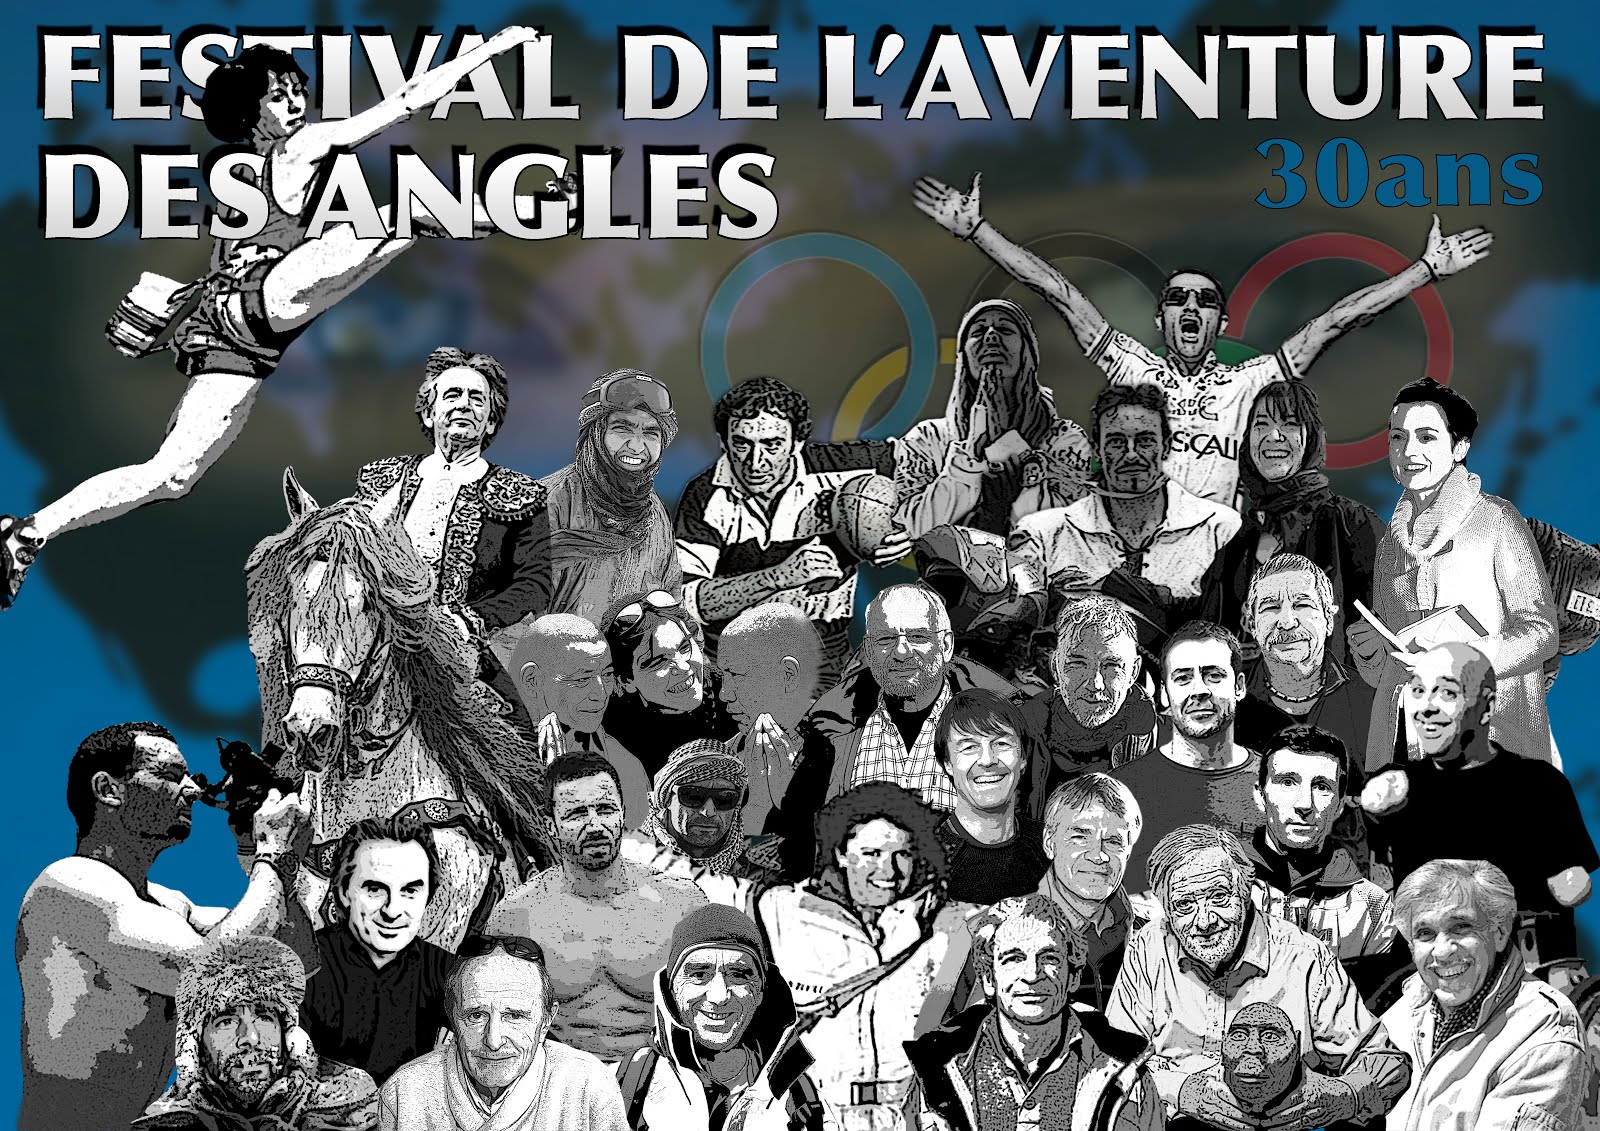 Festival de l'Aventure des Angles